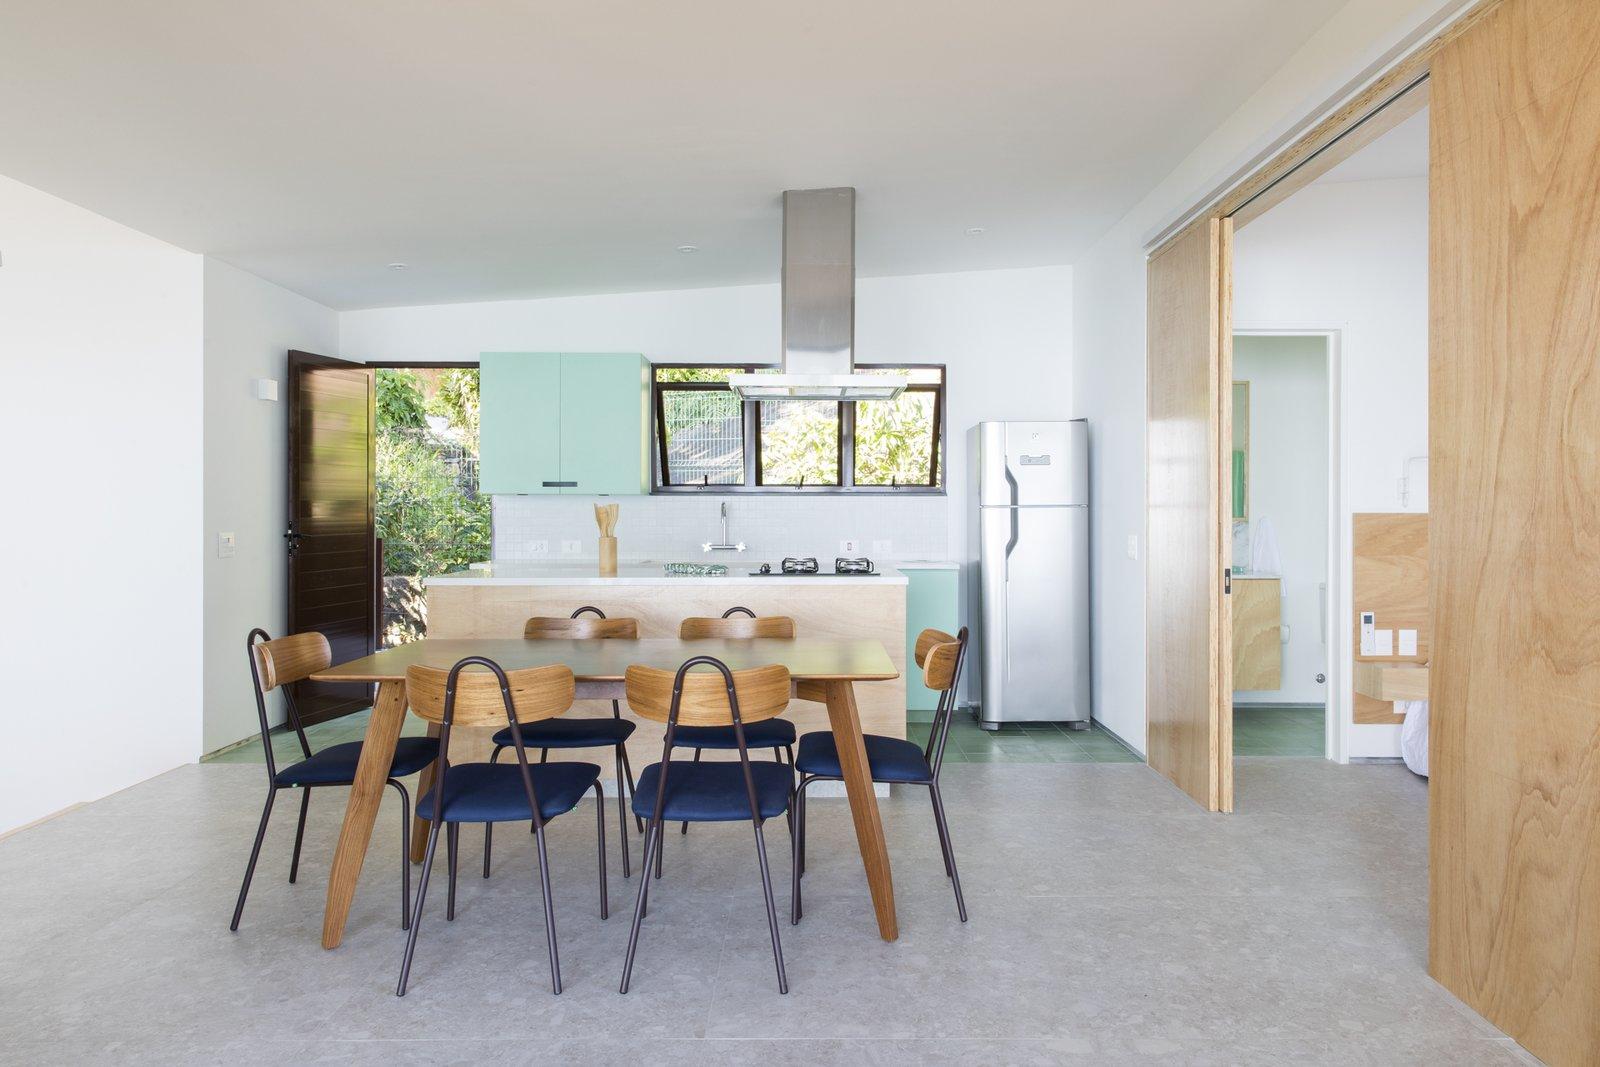 Dining Room, Table, Ceramic Tile Floor, Porcelain Tile Floor, Wall Lighting, Ceiling Lighting, and Chair designed by Estúdio Minke  Casa da Pedra (The stone house)